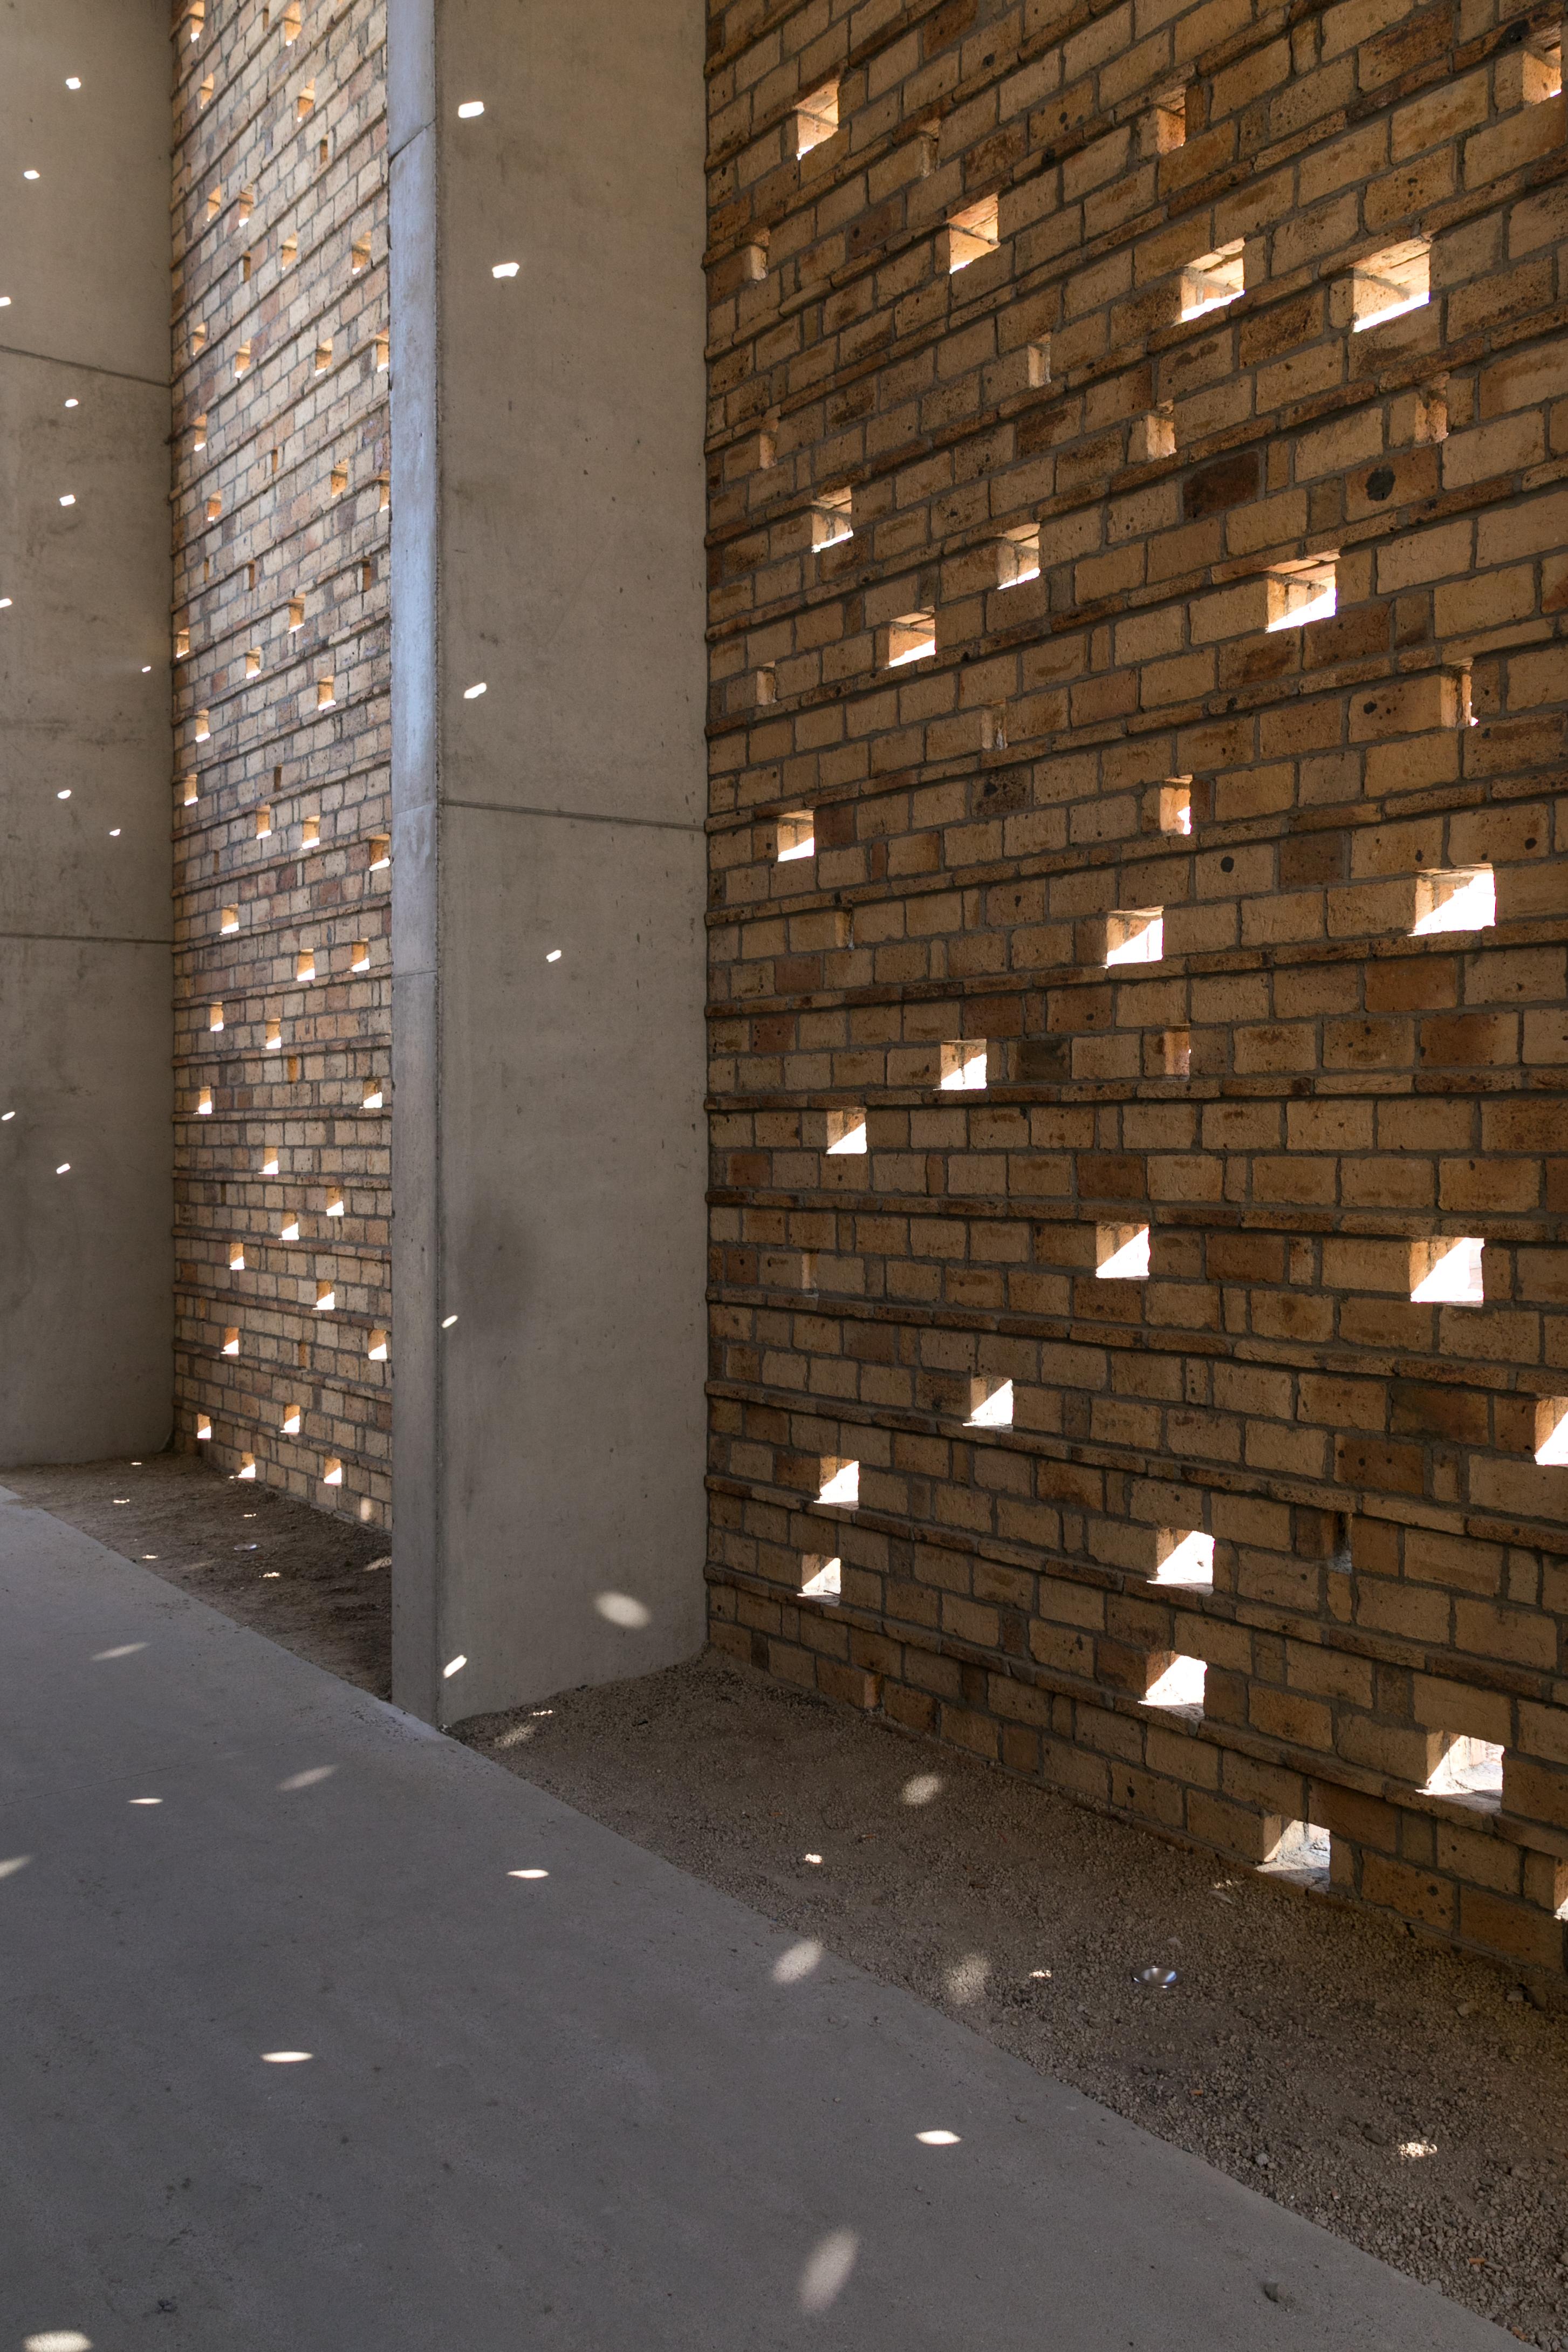 <p>Beeld Van Hout, Crematorium, Lommel &#8211; a2o-architecten</p>